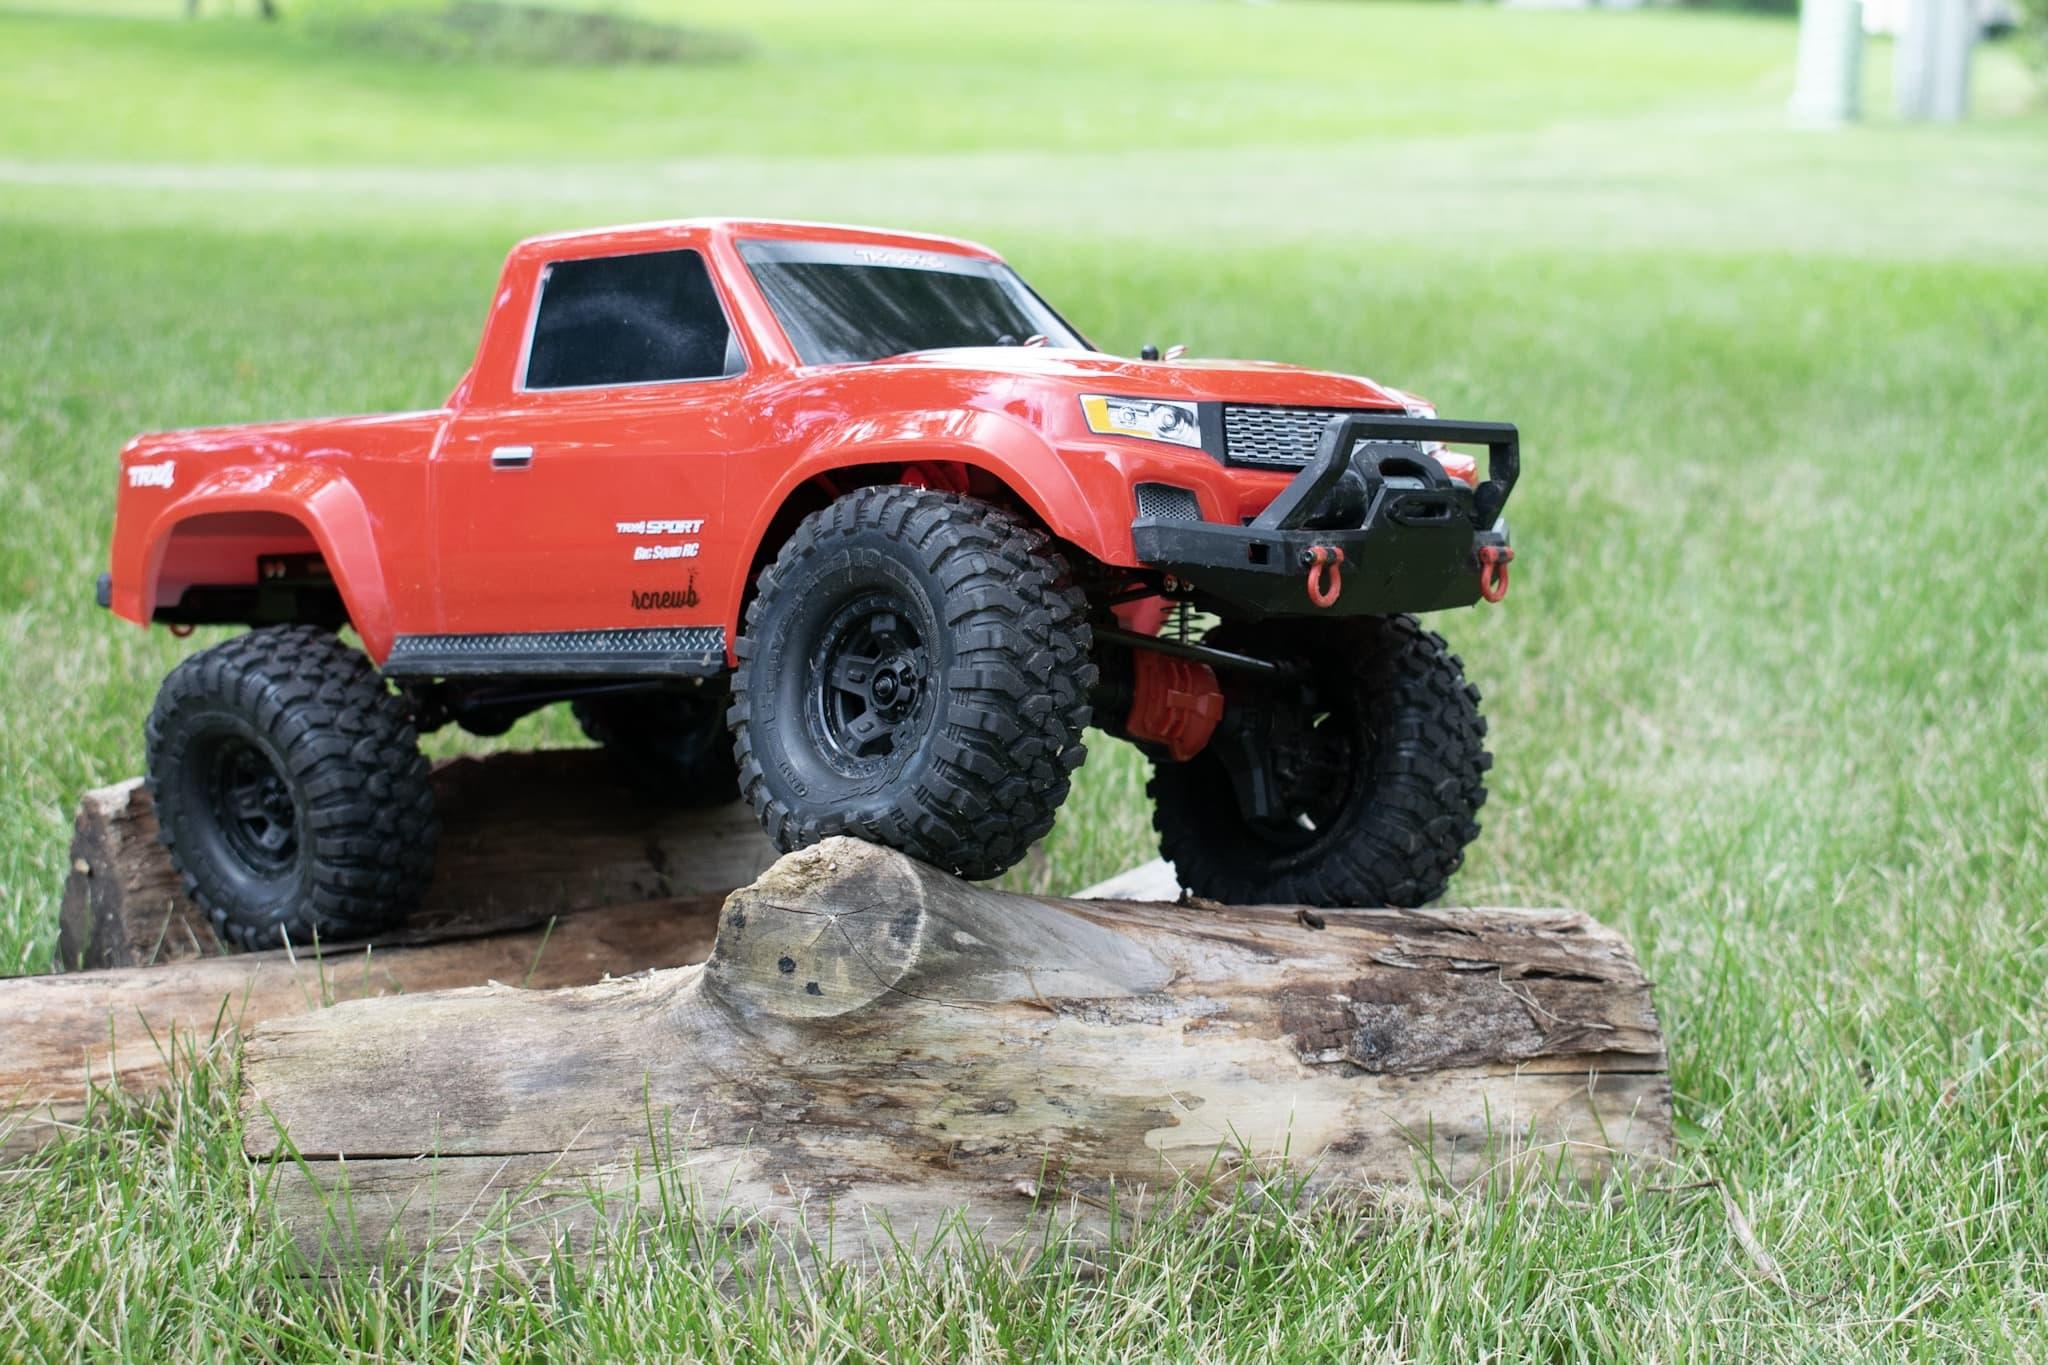 Traxxas TRX-4 Sport - Log Crawl Front